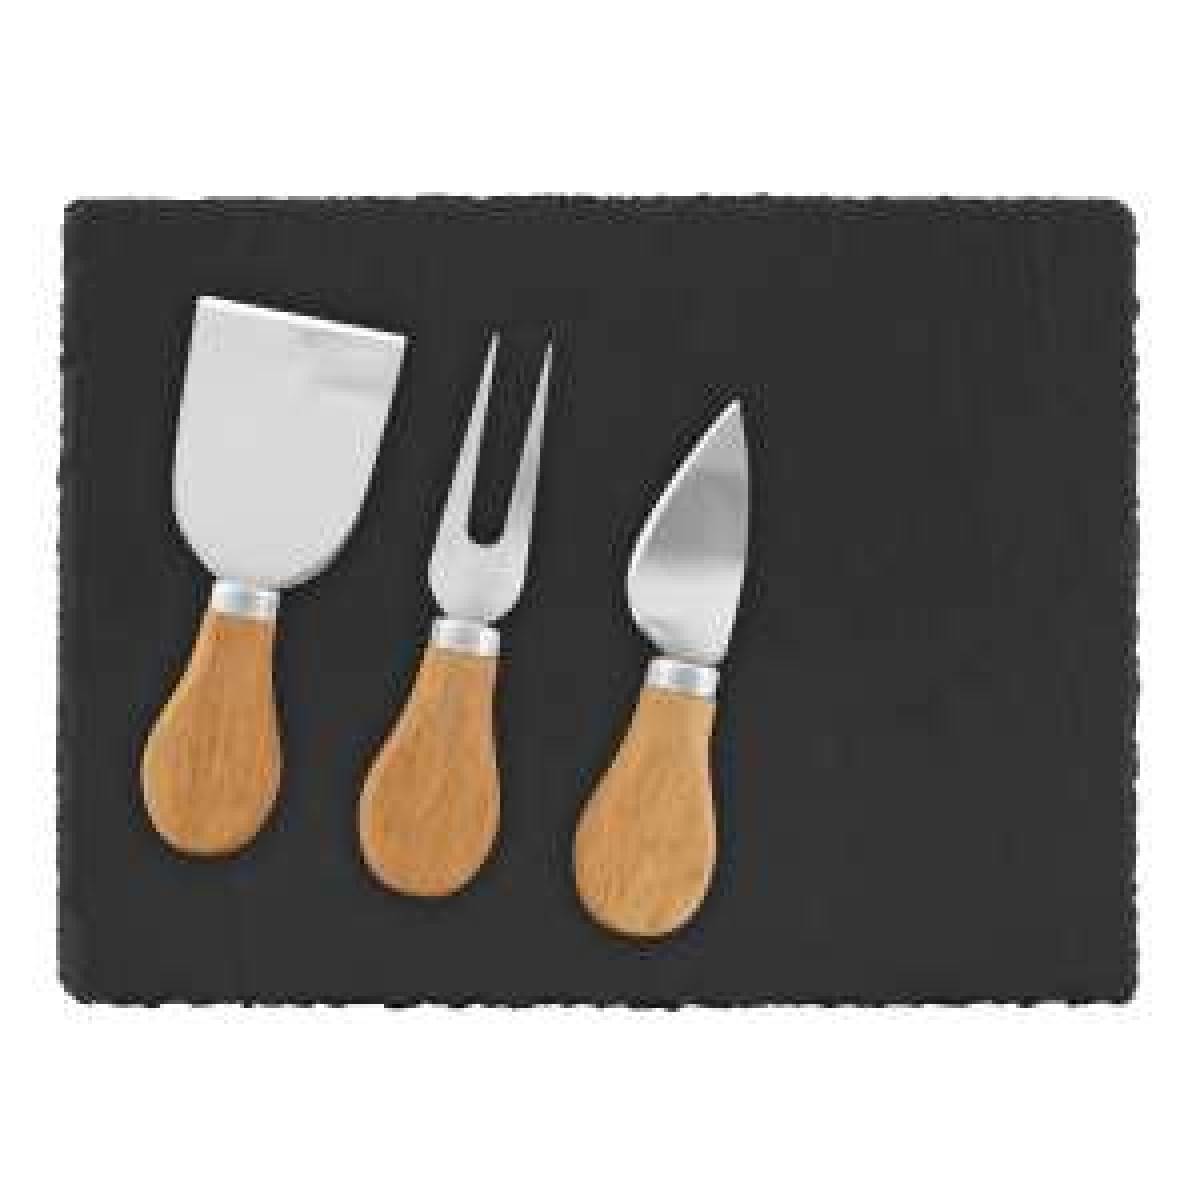 Robert Dyas - Slate Cheese Serving Platter Set - £7.19 w/c - Free C&C